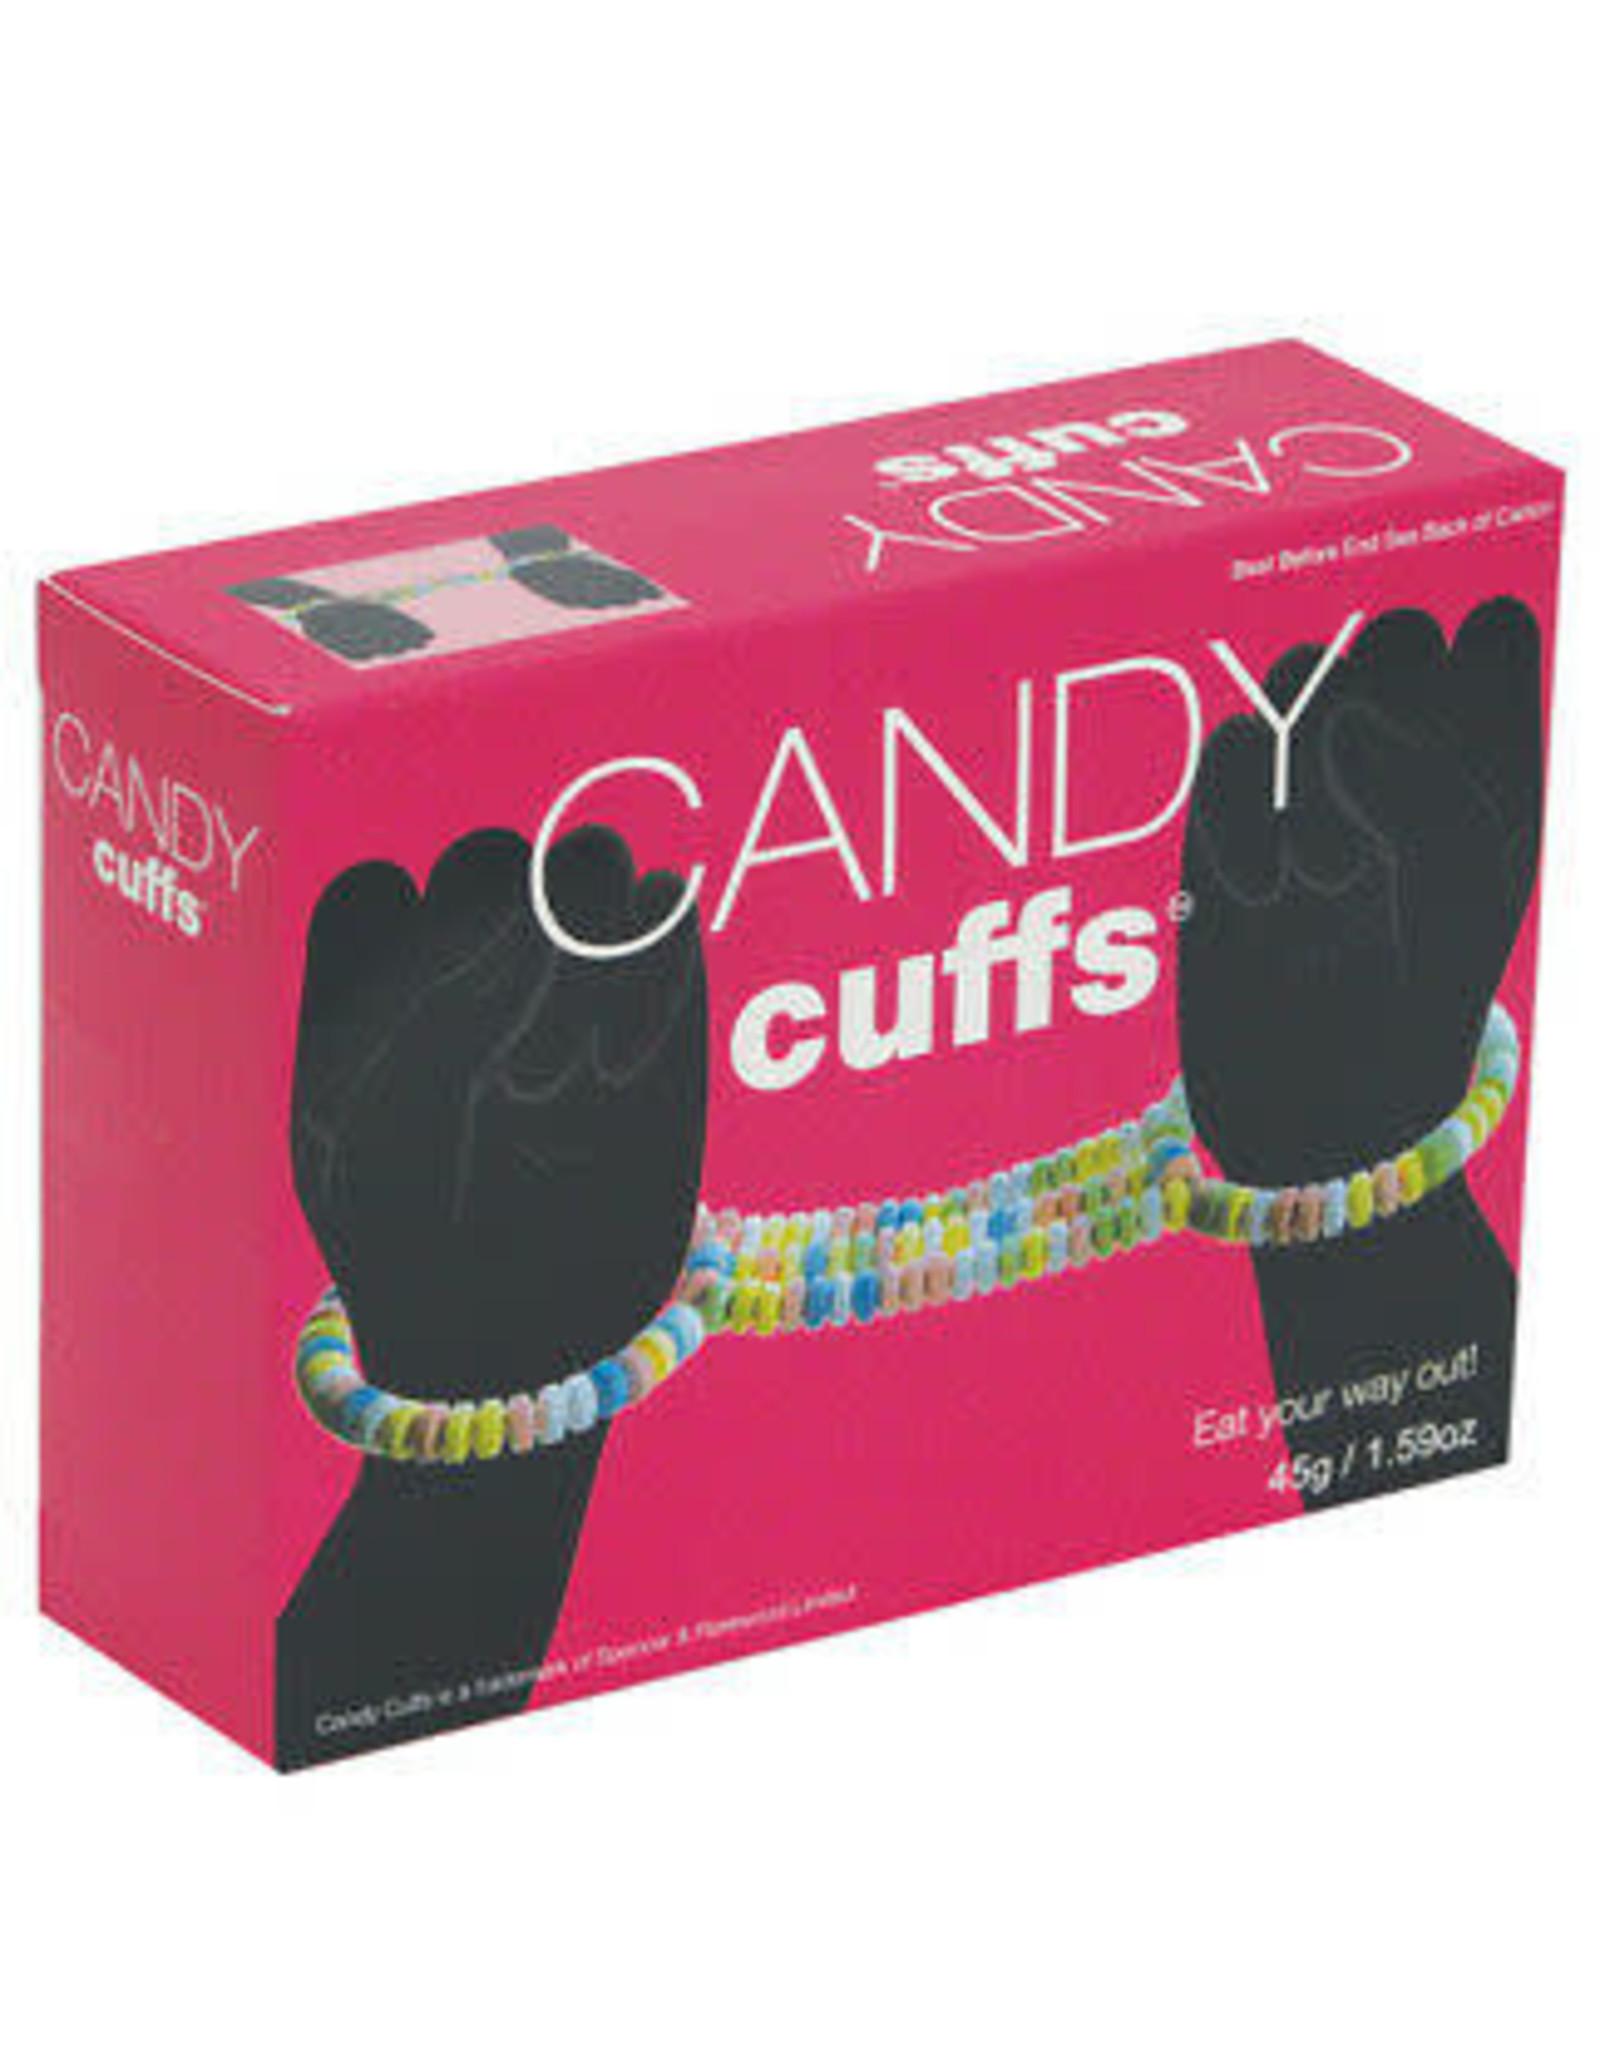 CANDY CUFFS